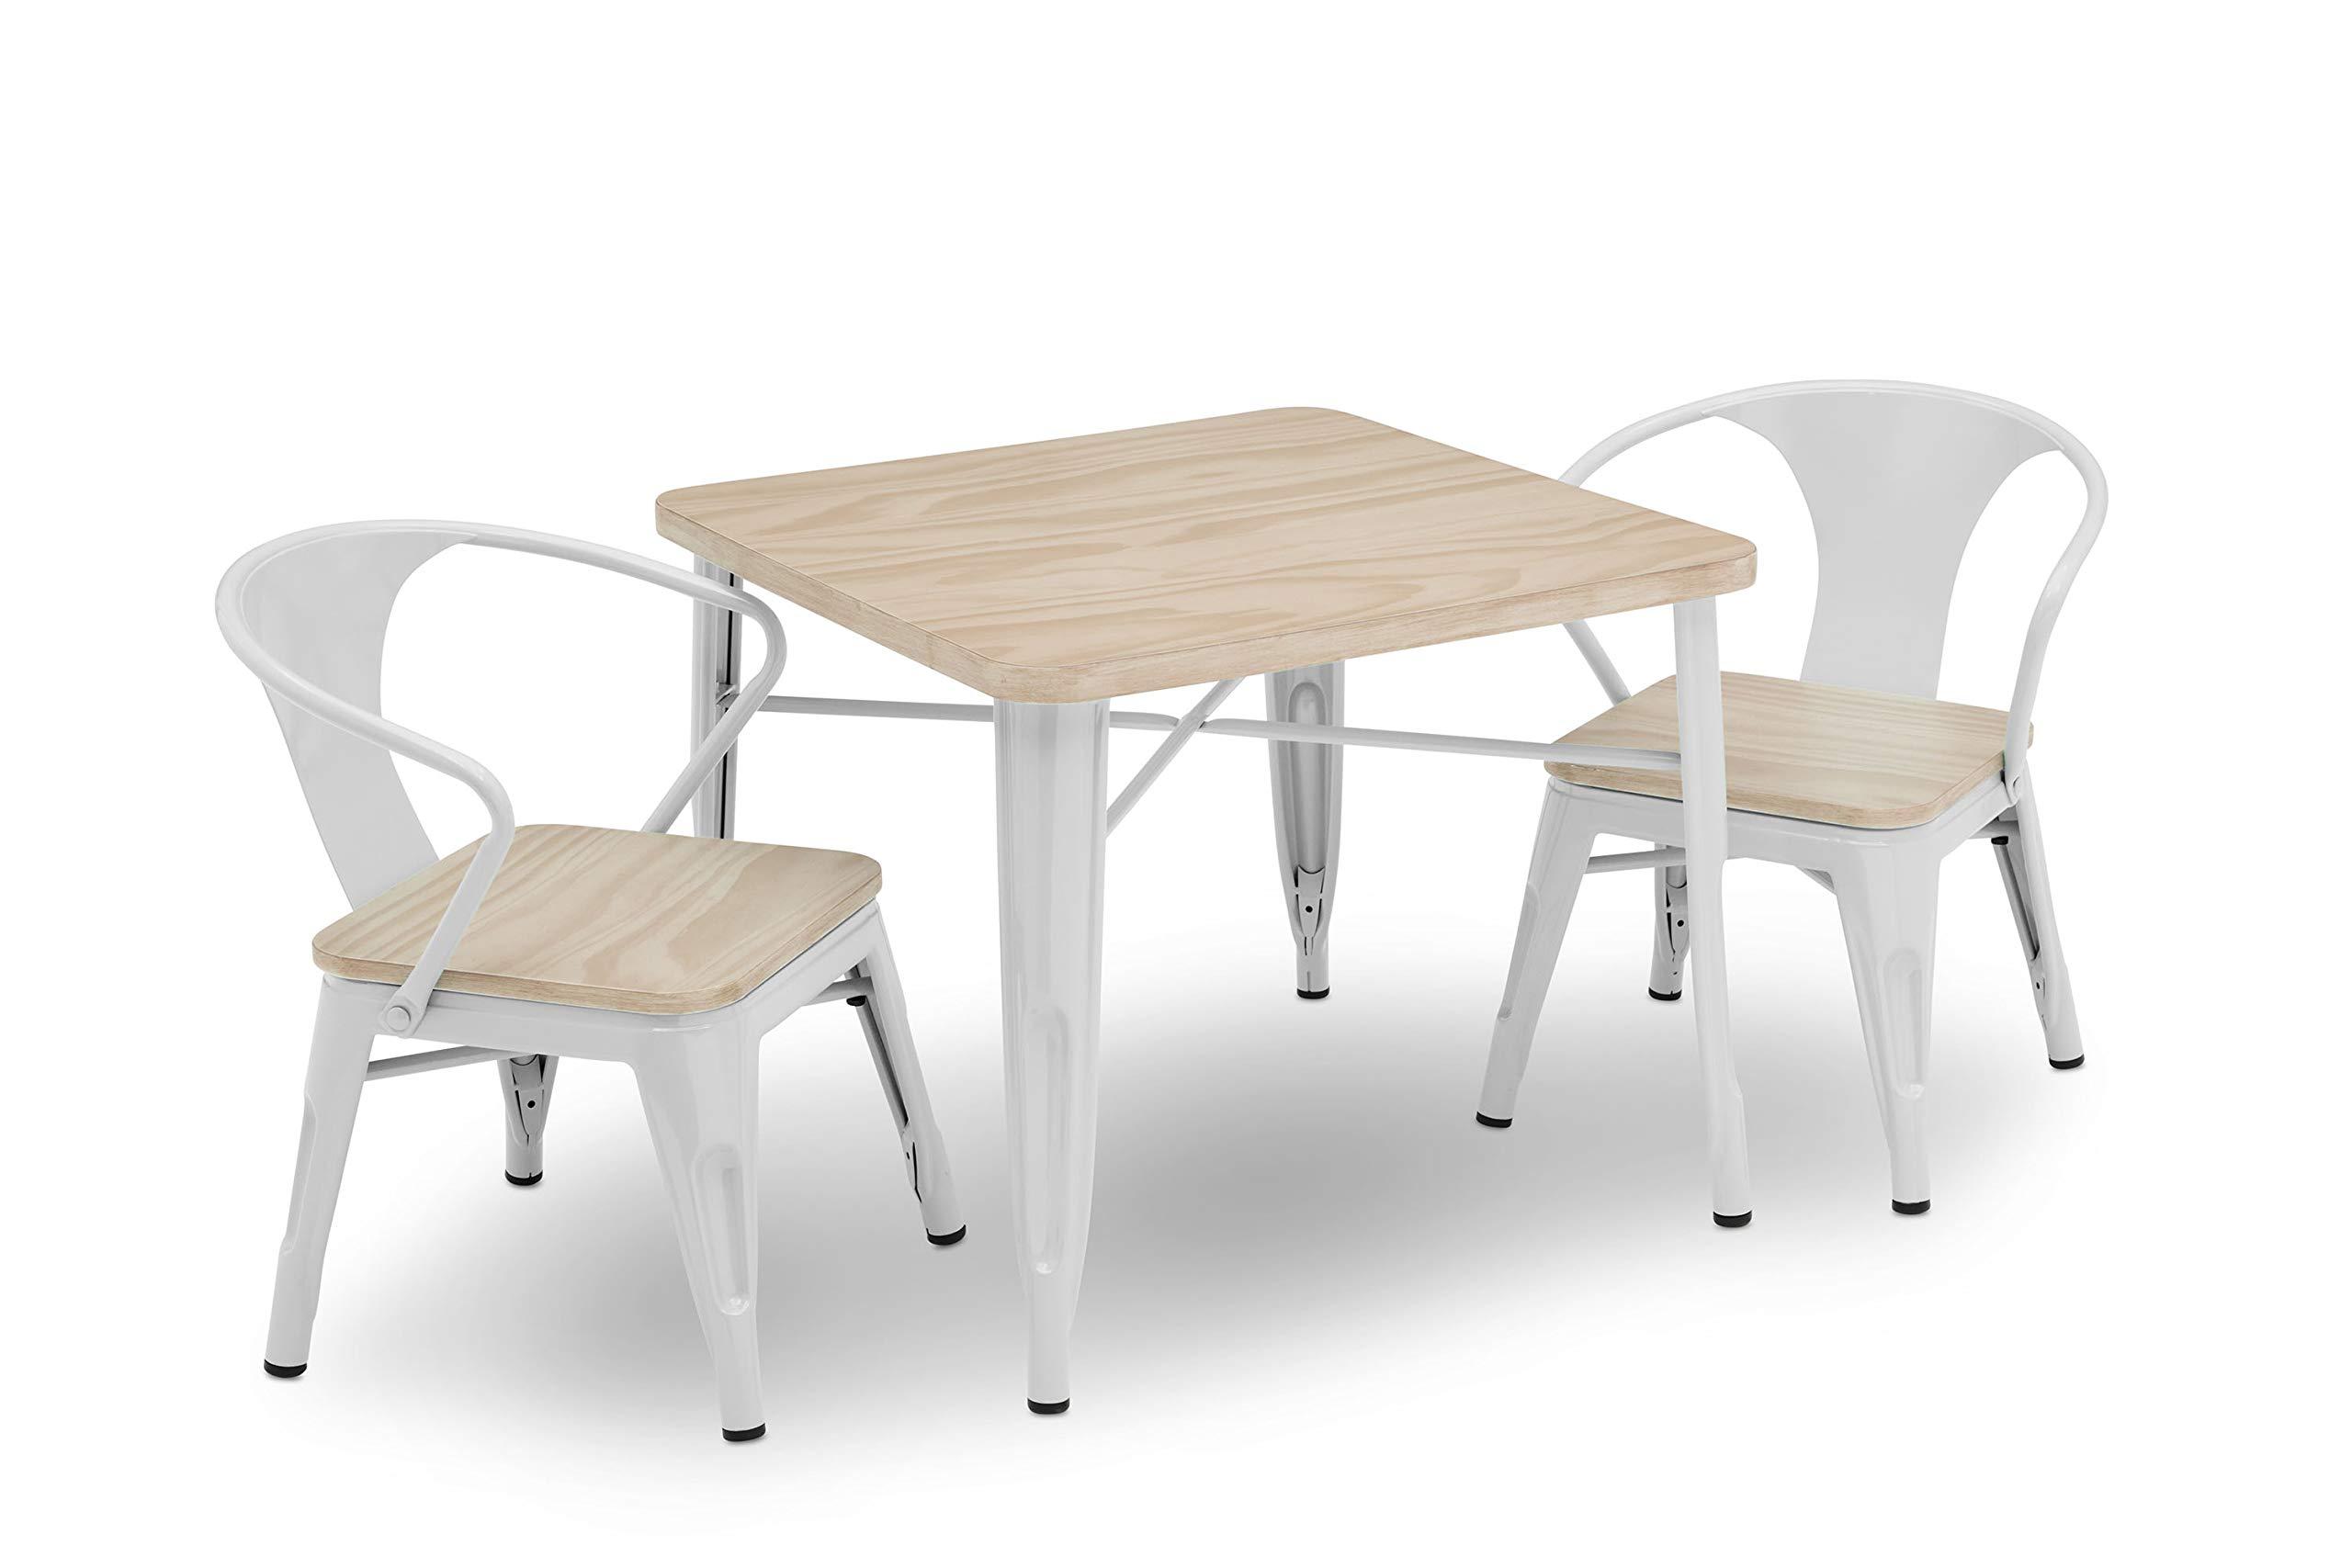 Delta Children Bistro Kids Play Table with 2-Piece Chair Set   White with Driftwood by Delta Children